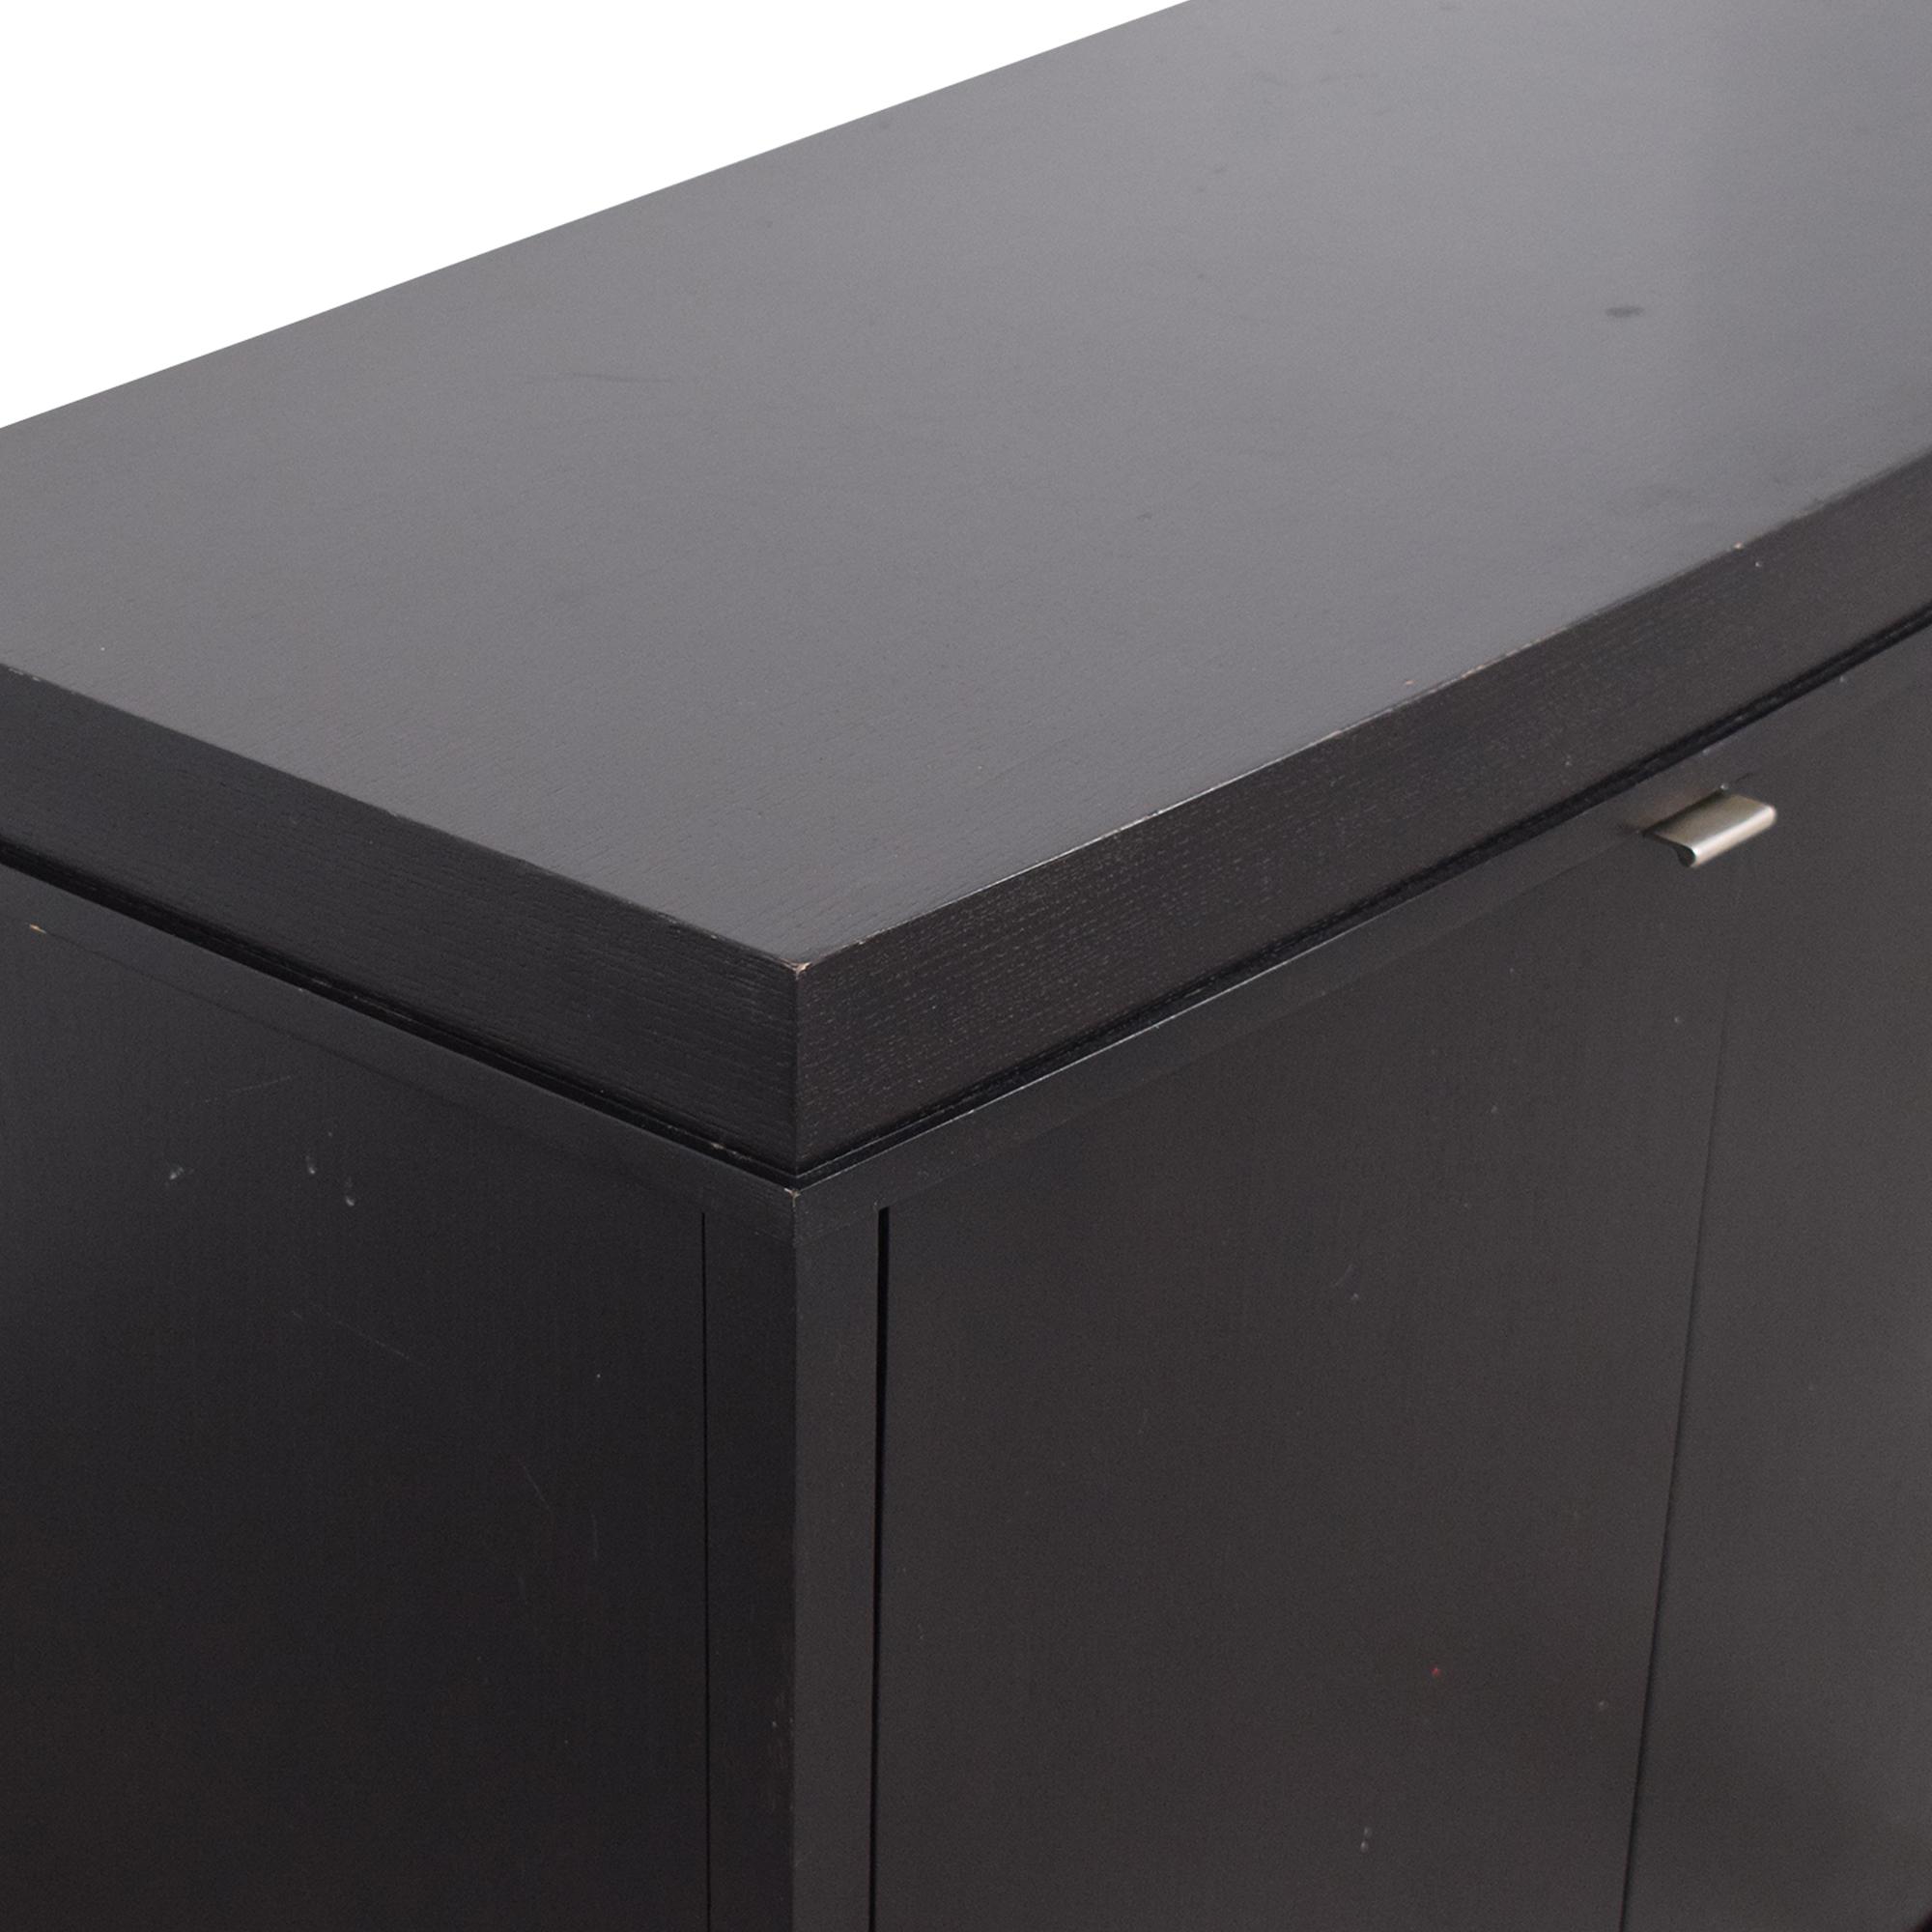 buy Crate & Barrel Sideboard Crate & Barrel Storage